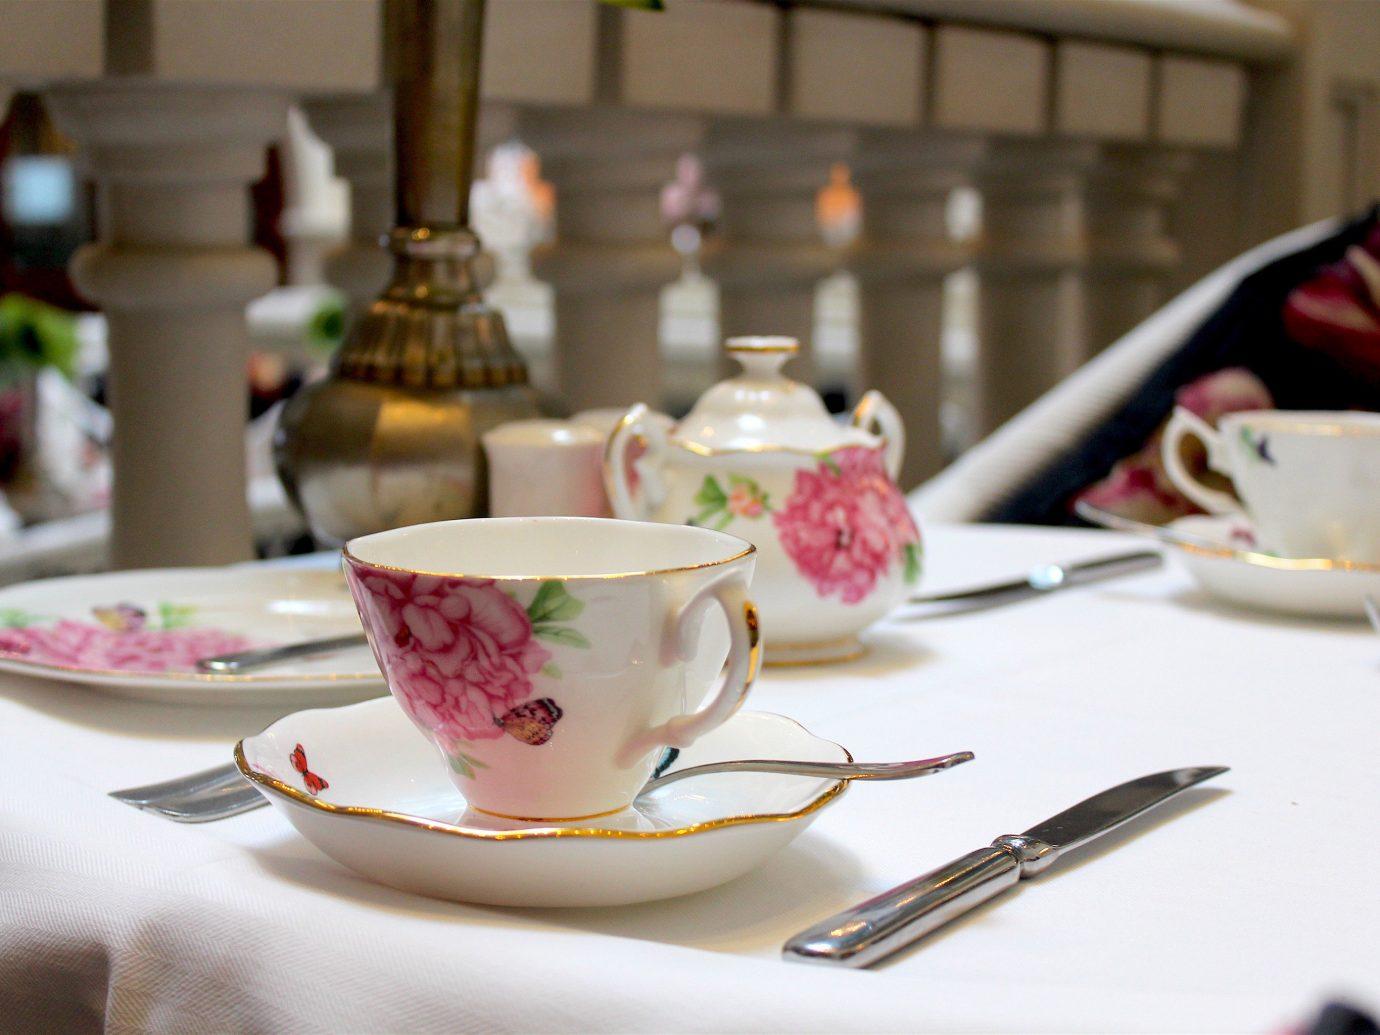 Hotels table indoor plate meal brunch dinner restaurant Design flower lunch dining table